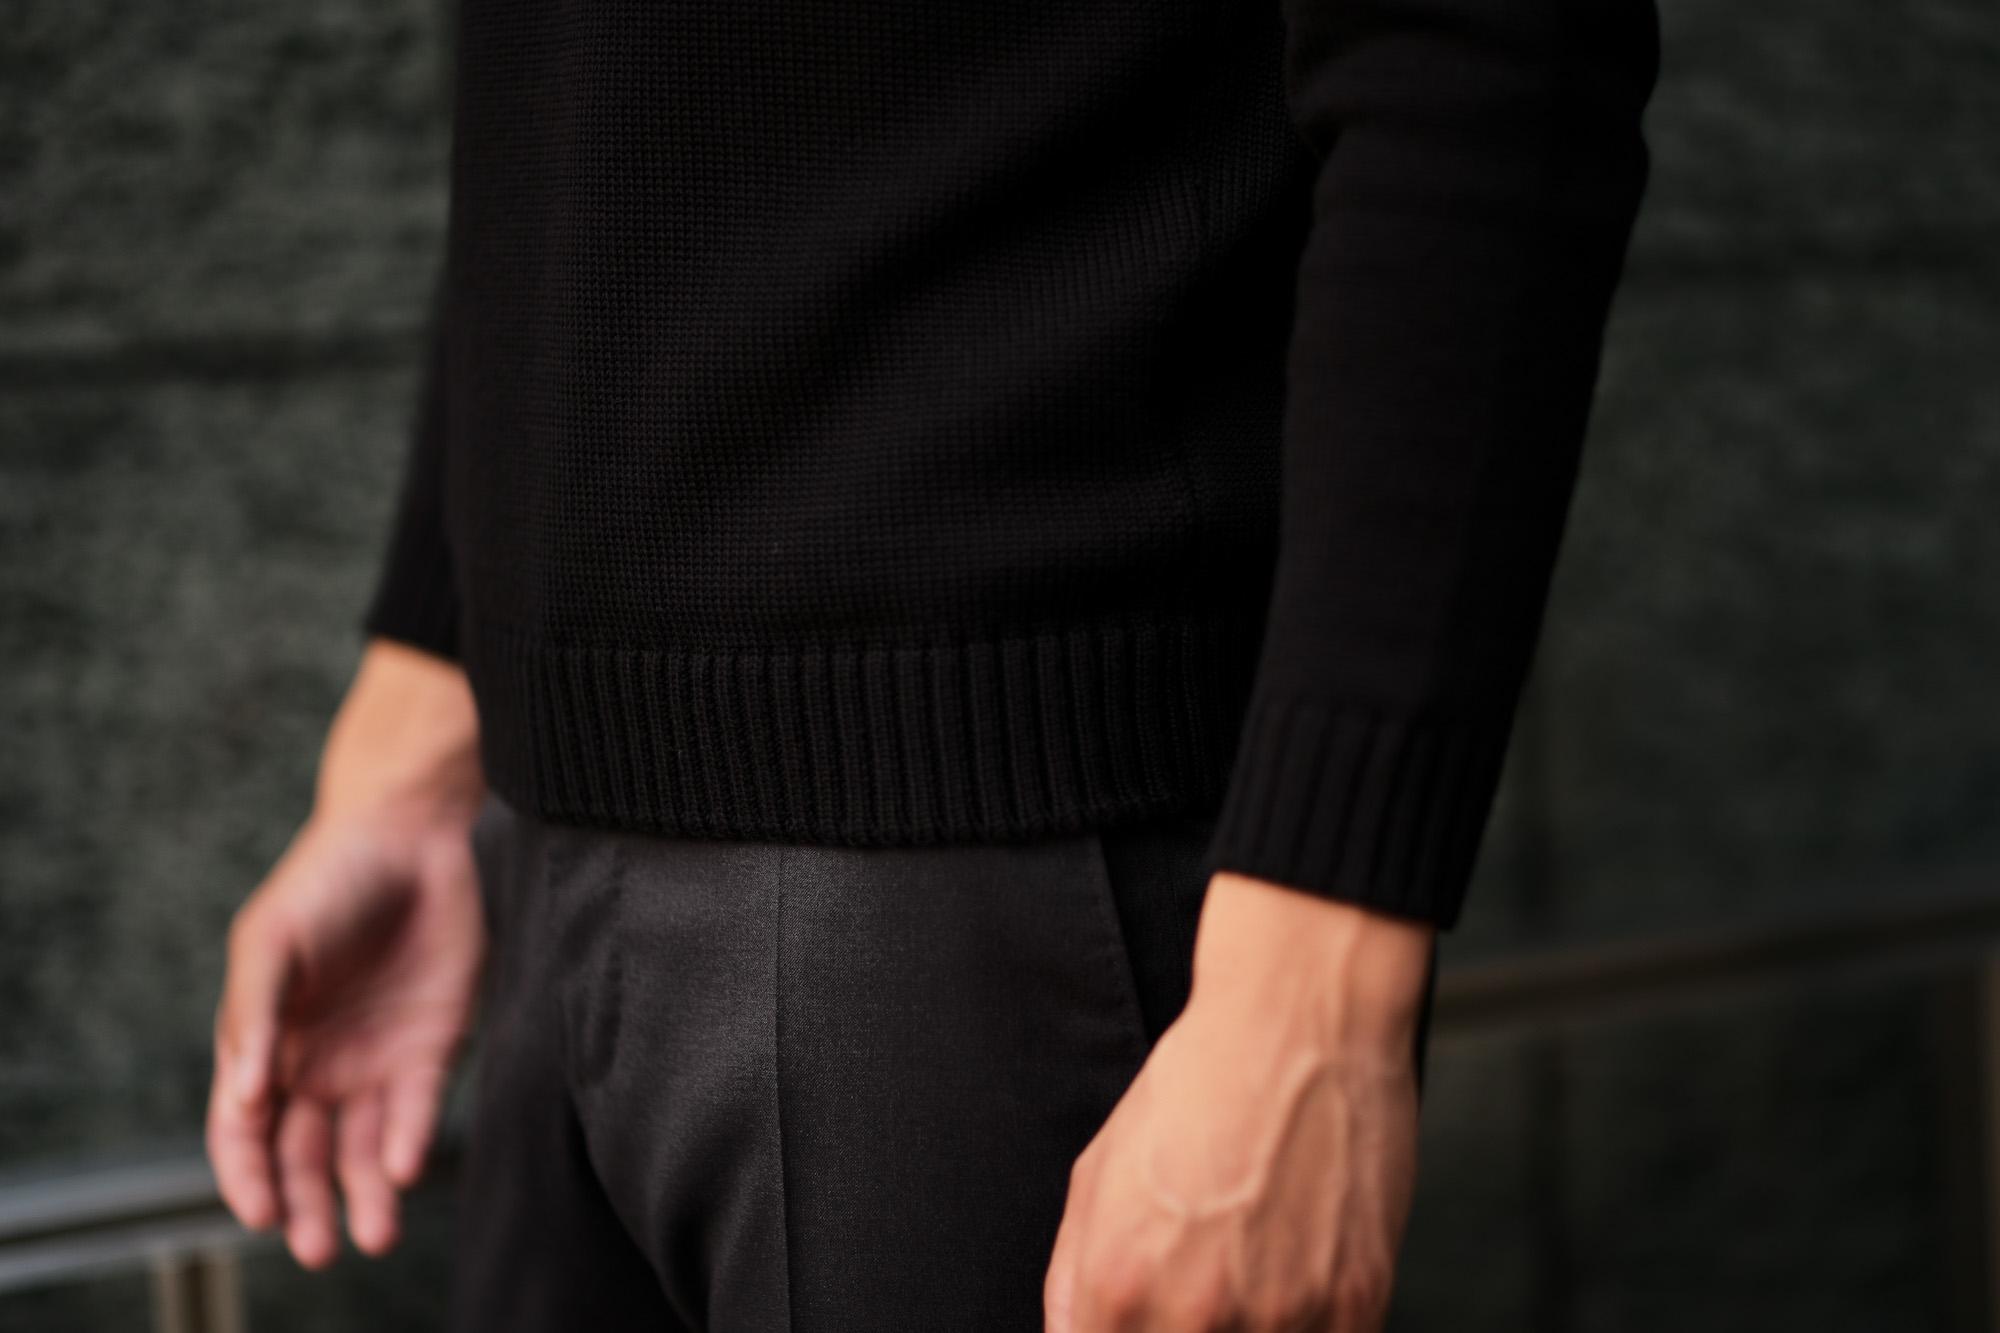 ZANONE (ザノーネ) Turtle Neck Sweater (タートルネックセーター) 810005 Z0229 VIRGIN WOOL 100% ミドルゲージ ウールニット セーター BLACK (ブラック・Z0015) made in italy (イタリア製) 2019 秋冬新作 【入荷済みとなります】【発売中】  zanone ニット クルーネック 愛知 名古屋 Alto e Diritto アルト エ デリット